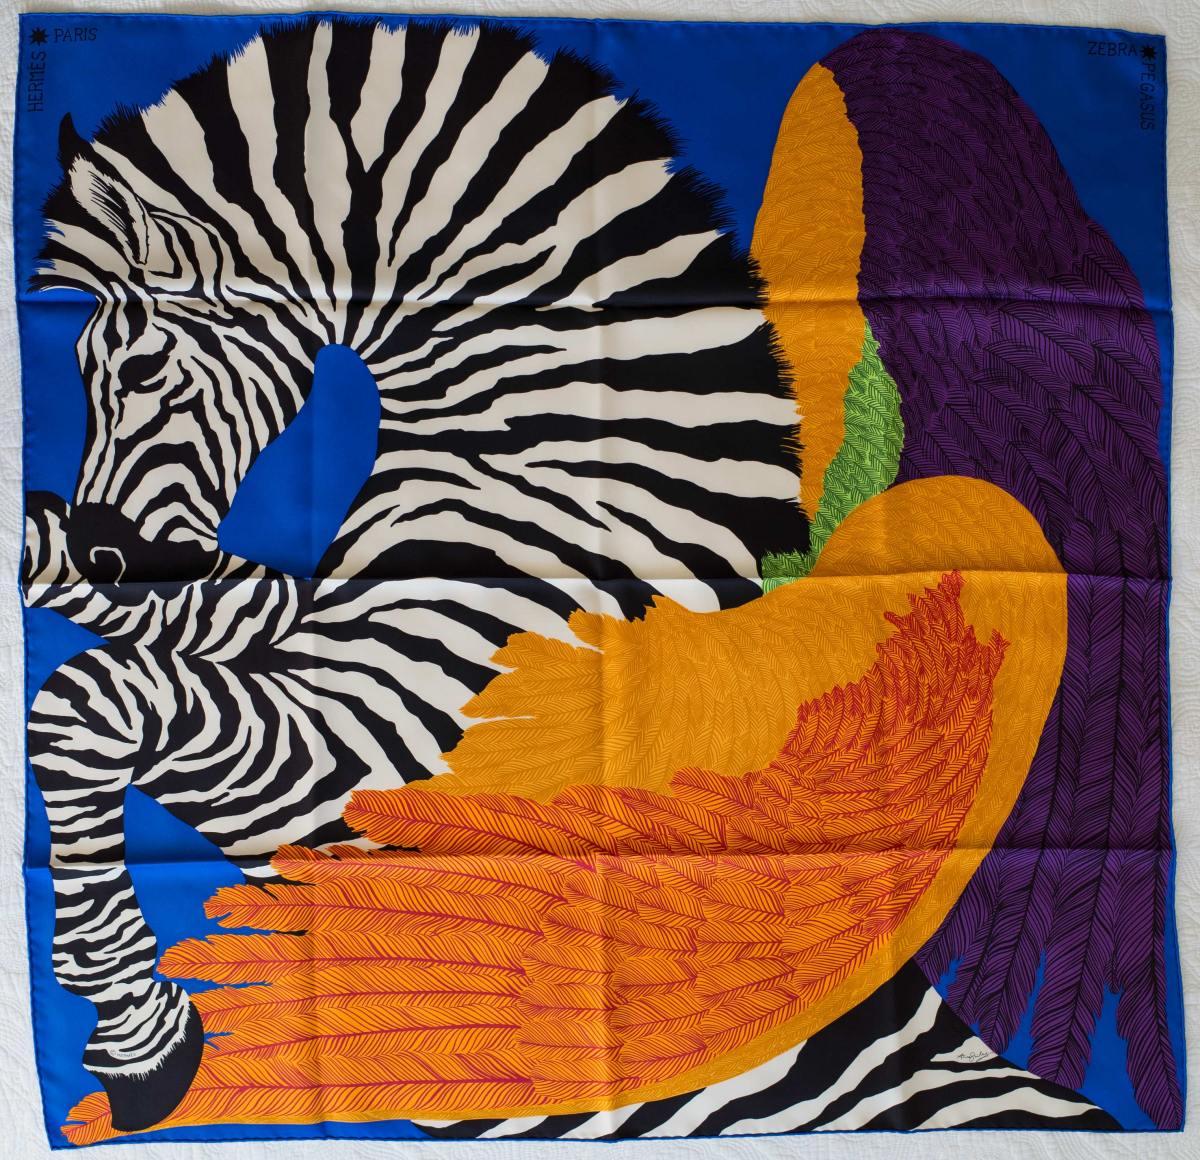 Hermes, Hermes carre, foulard, scarf, how to wear a scarf, Zebra Pegasus, как красиво завязать платок, Эрмес